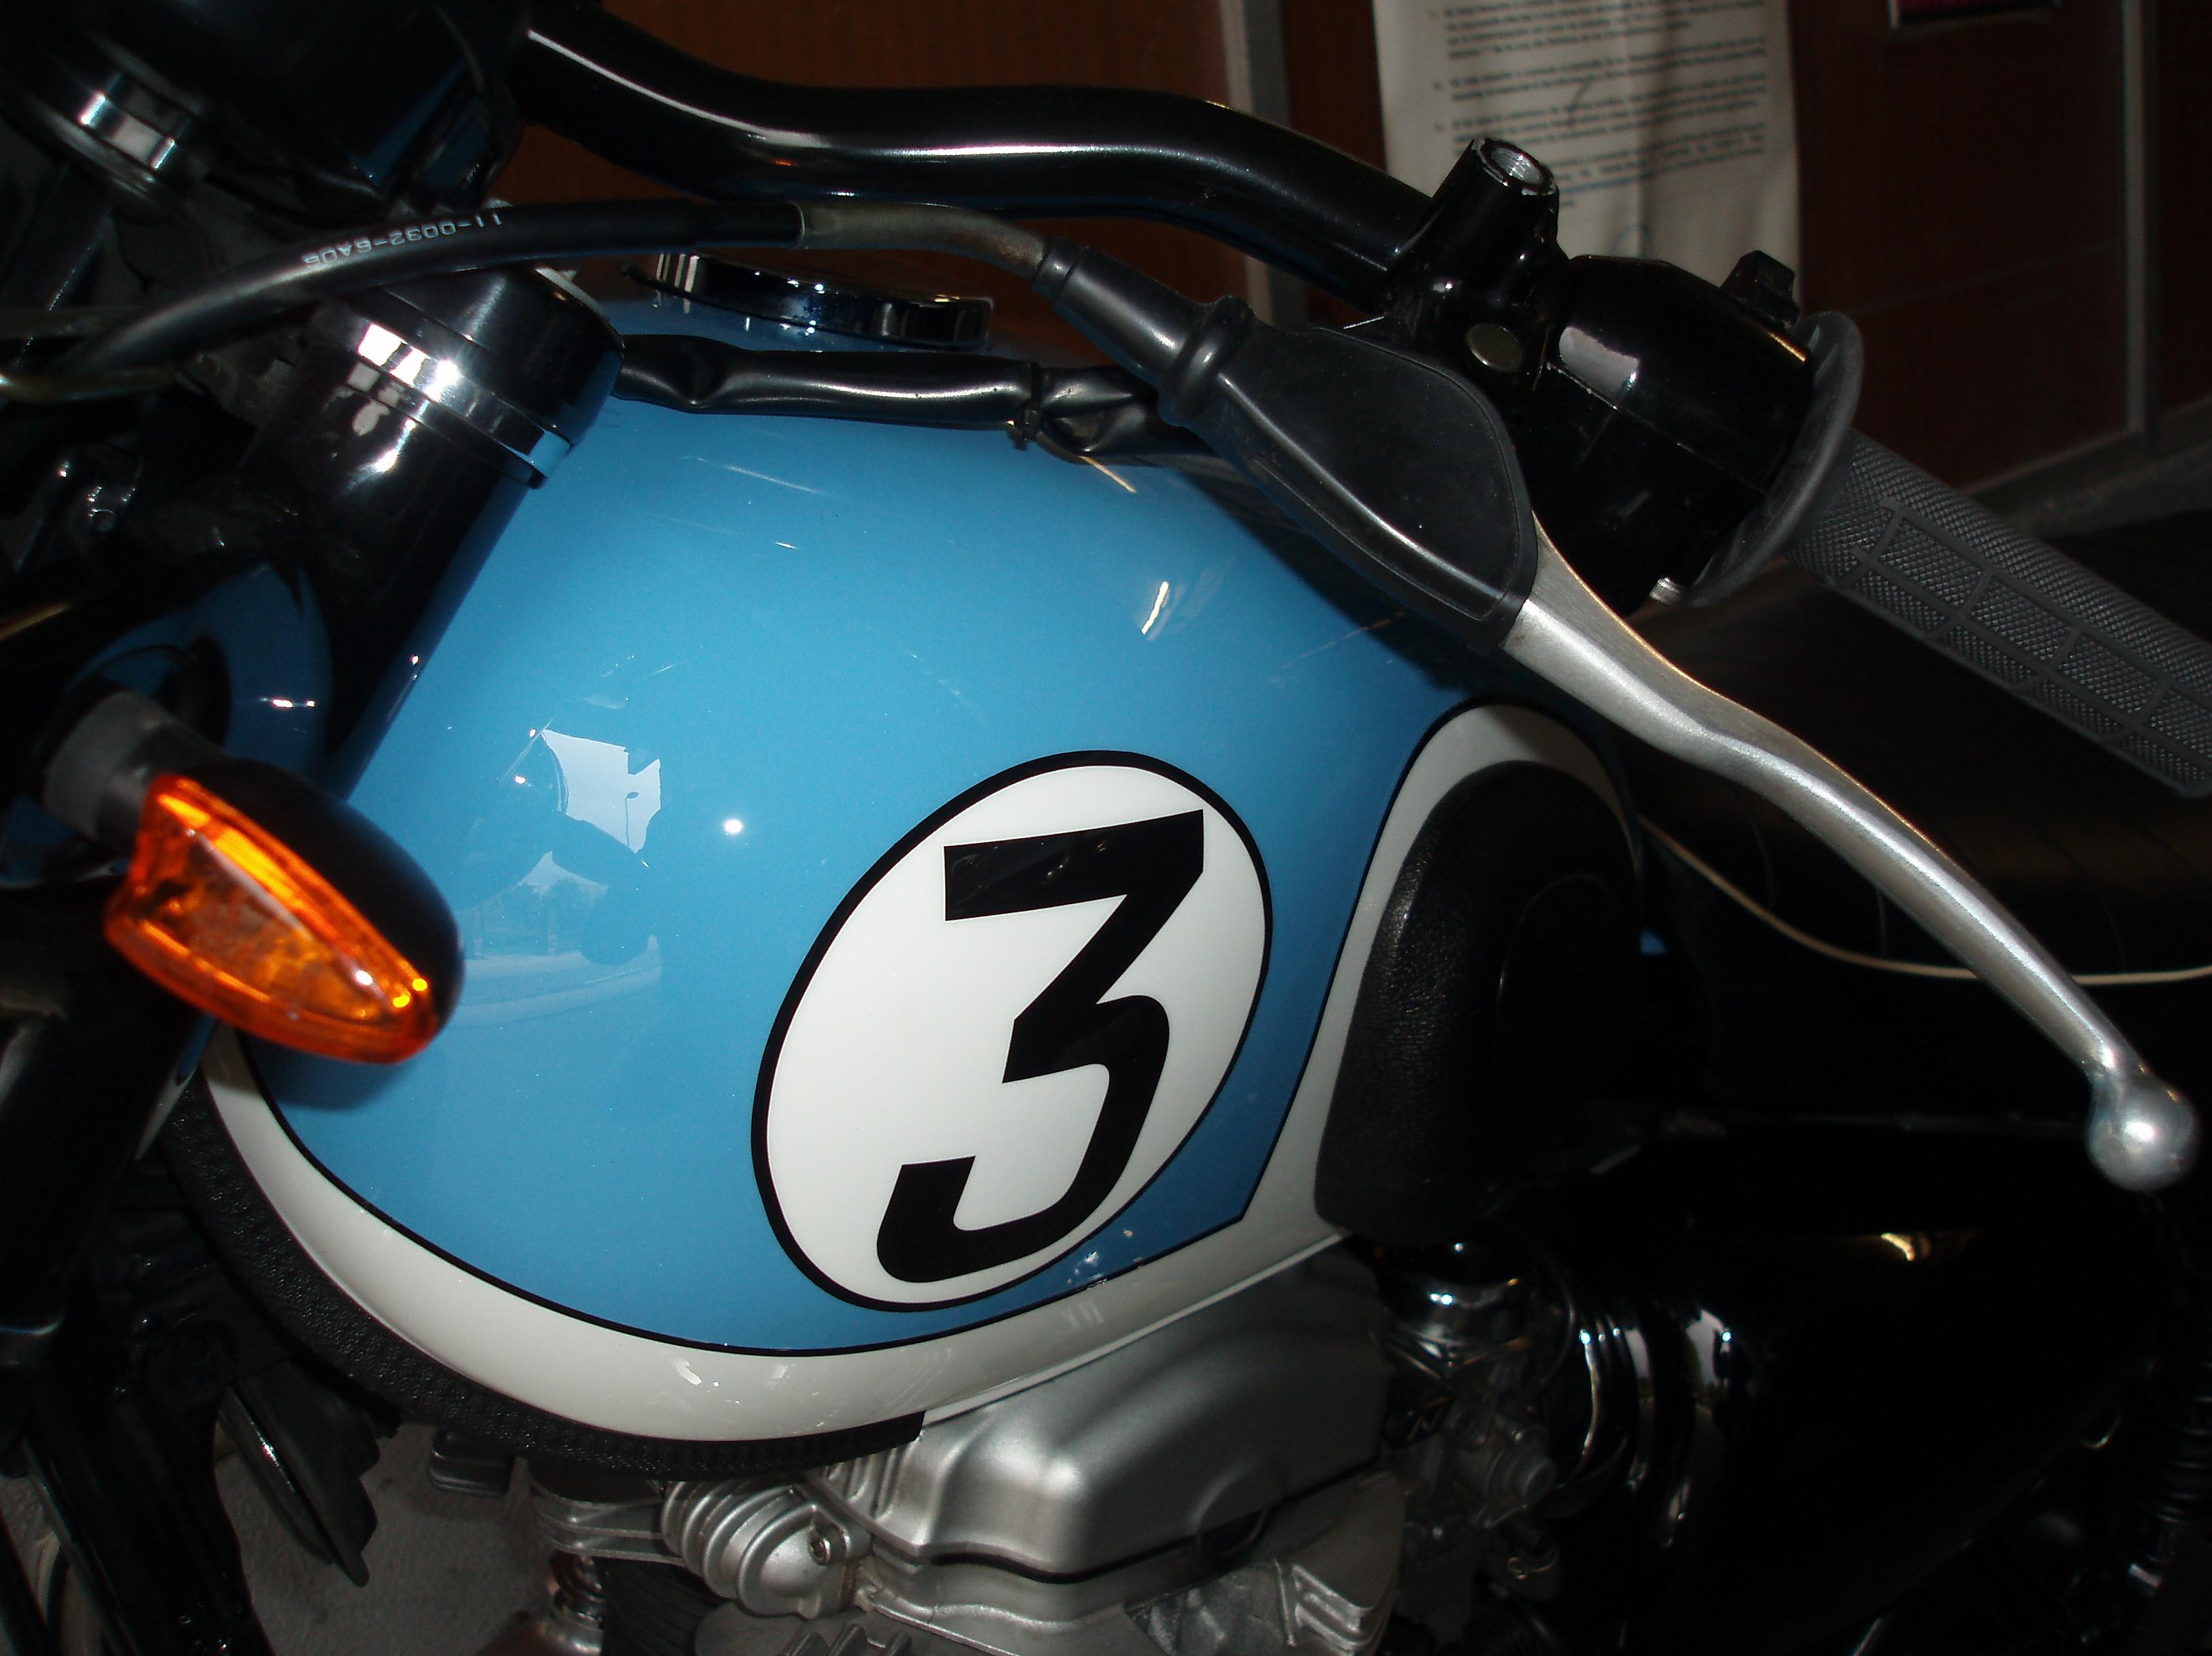 Foto 34 de Motos en Vigo | Moto 2